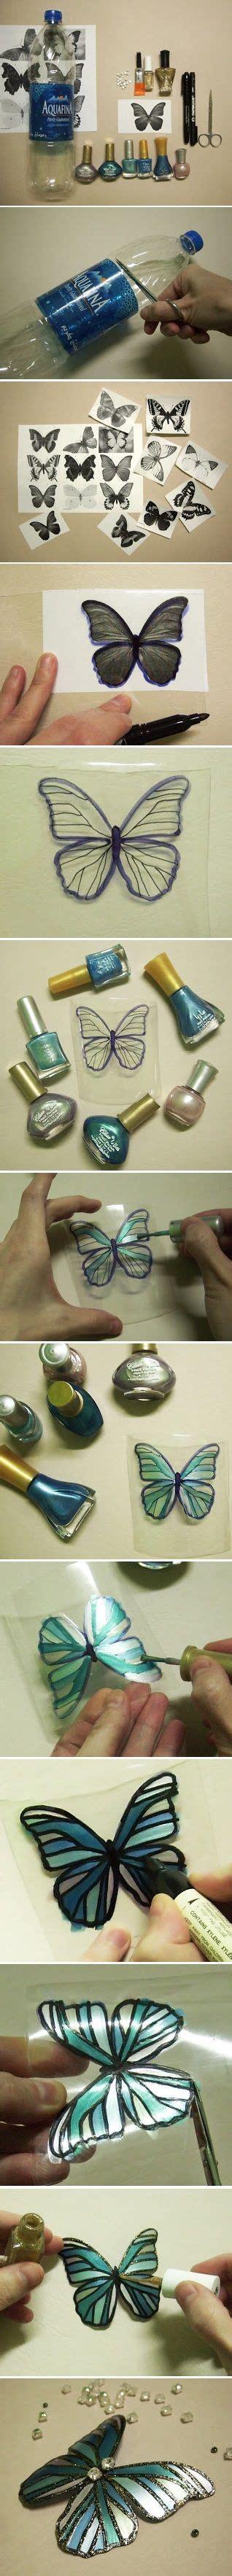 kiss ide tutorial cara membuat kupu kupu cantik dari botol plastik bekas